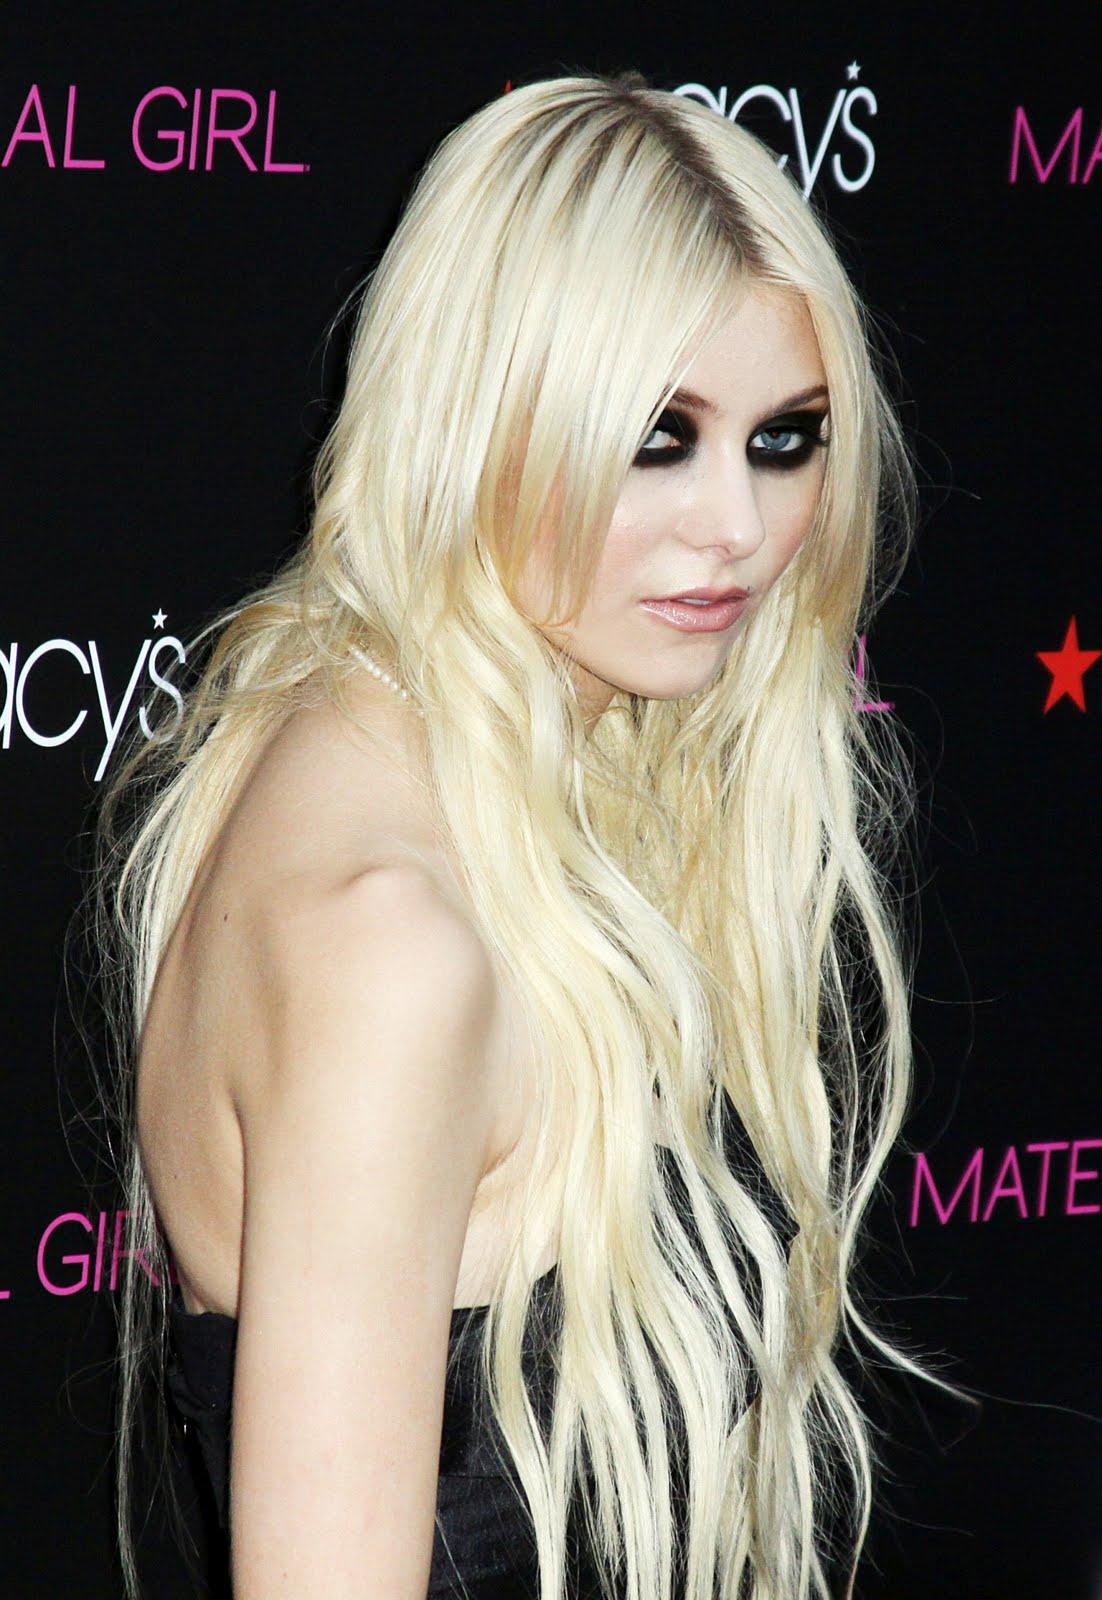 http://2.bp.blogspot.com/_sTqirJklW0Q/TJ3kDi1EMyI/AAAAAAAAAJk/_cKGOTYyaxk/s1600/Taylor-Momsen-72.jpg